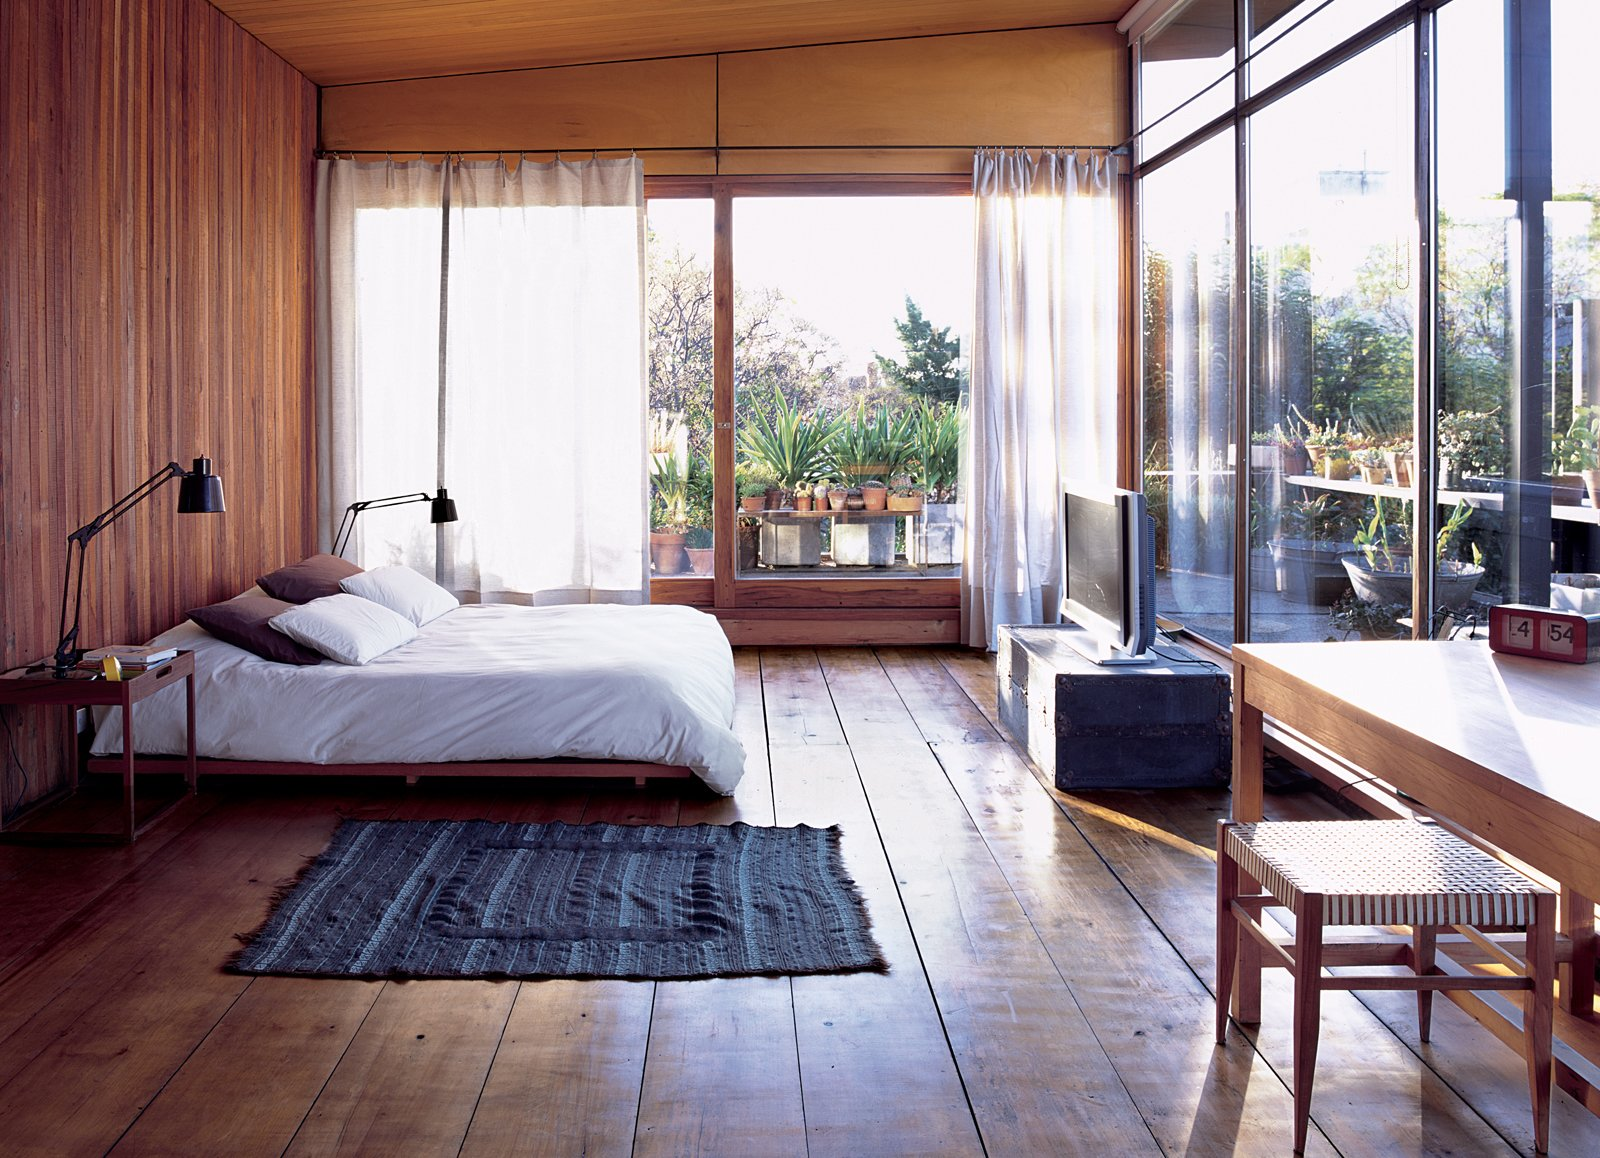 A Cozy And Modern Indoor-Outdoor Bedroom In Buenos Aires